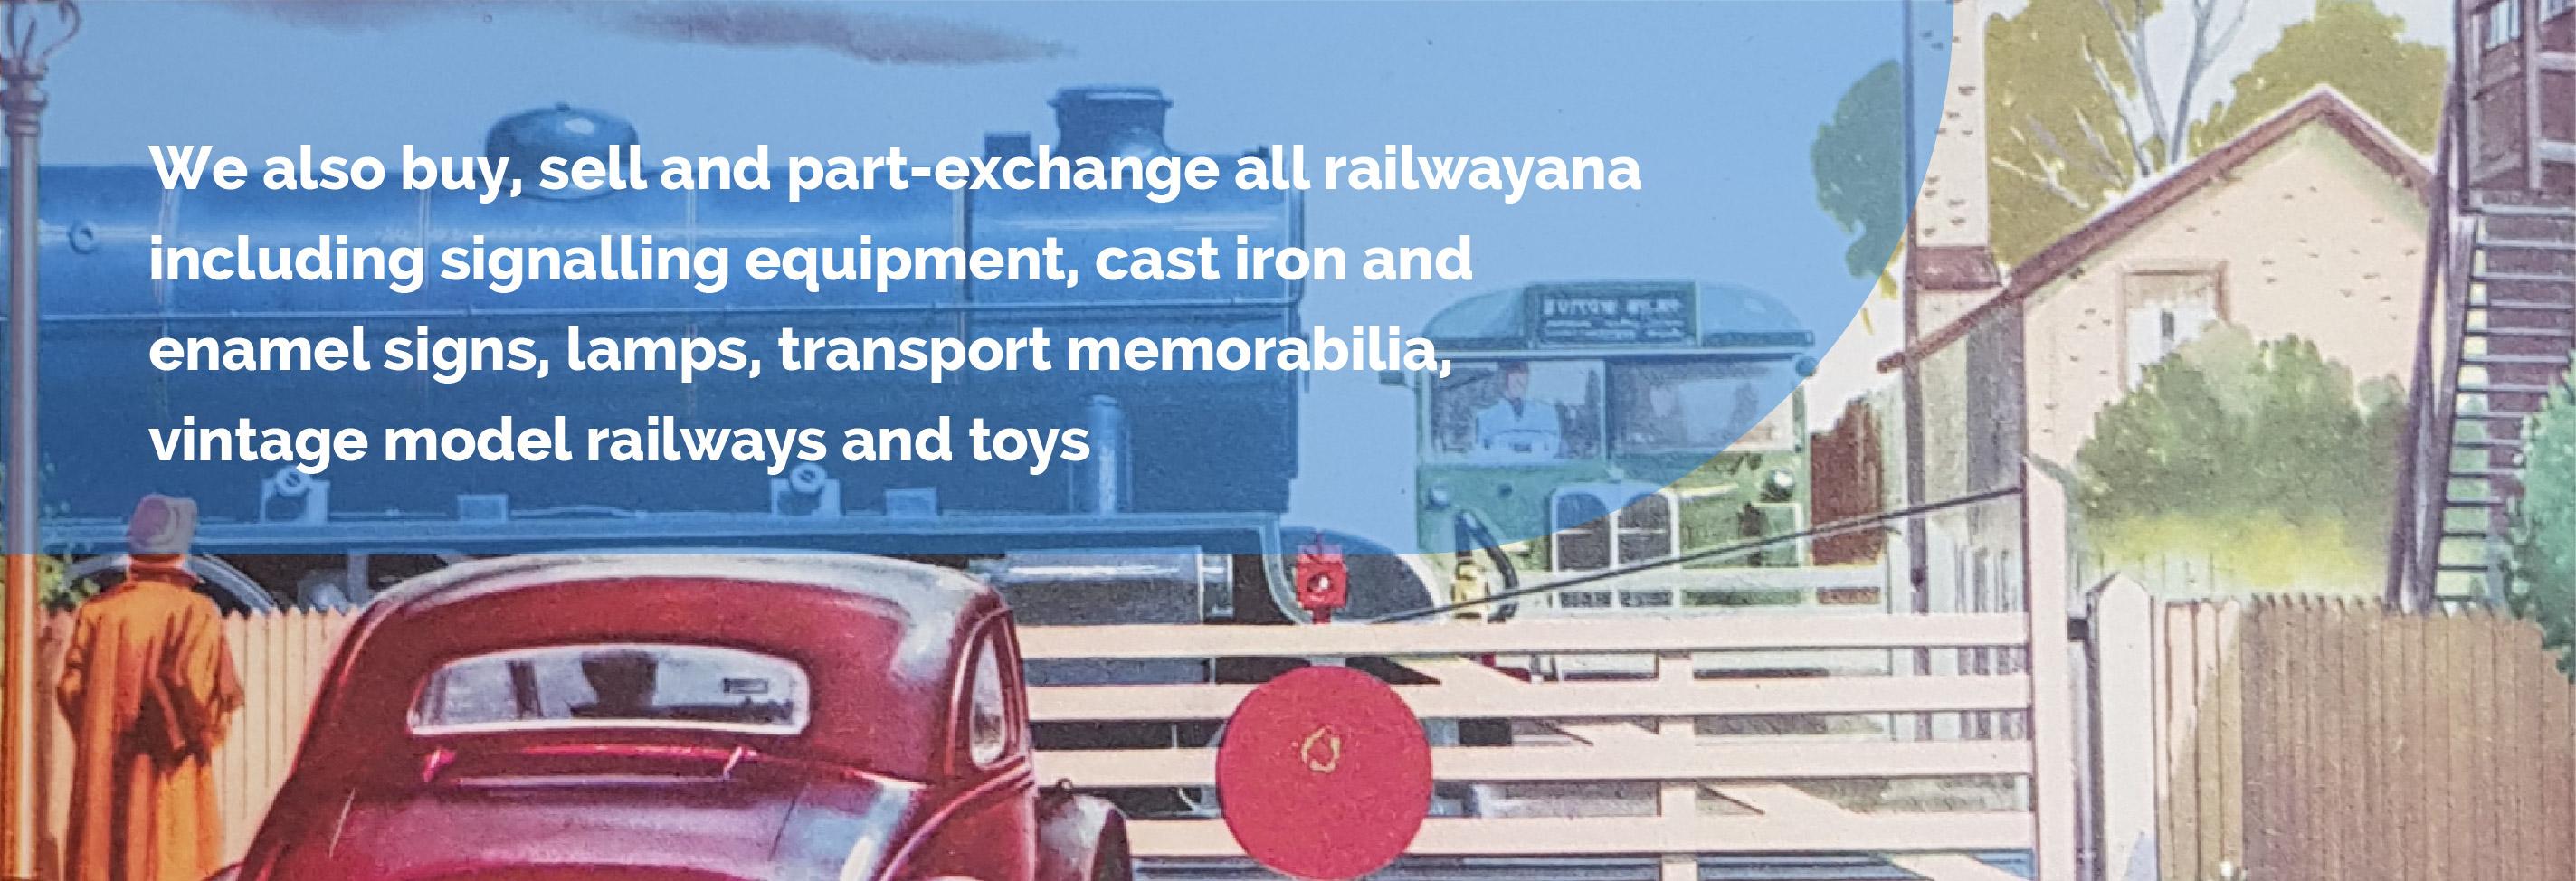 railwayana-sliders-09.jpg